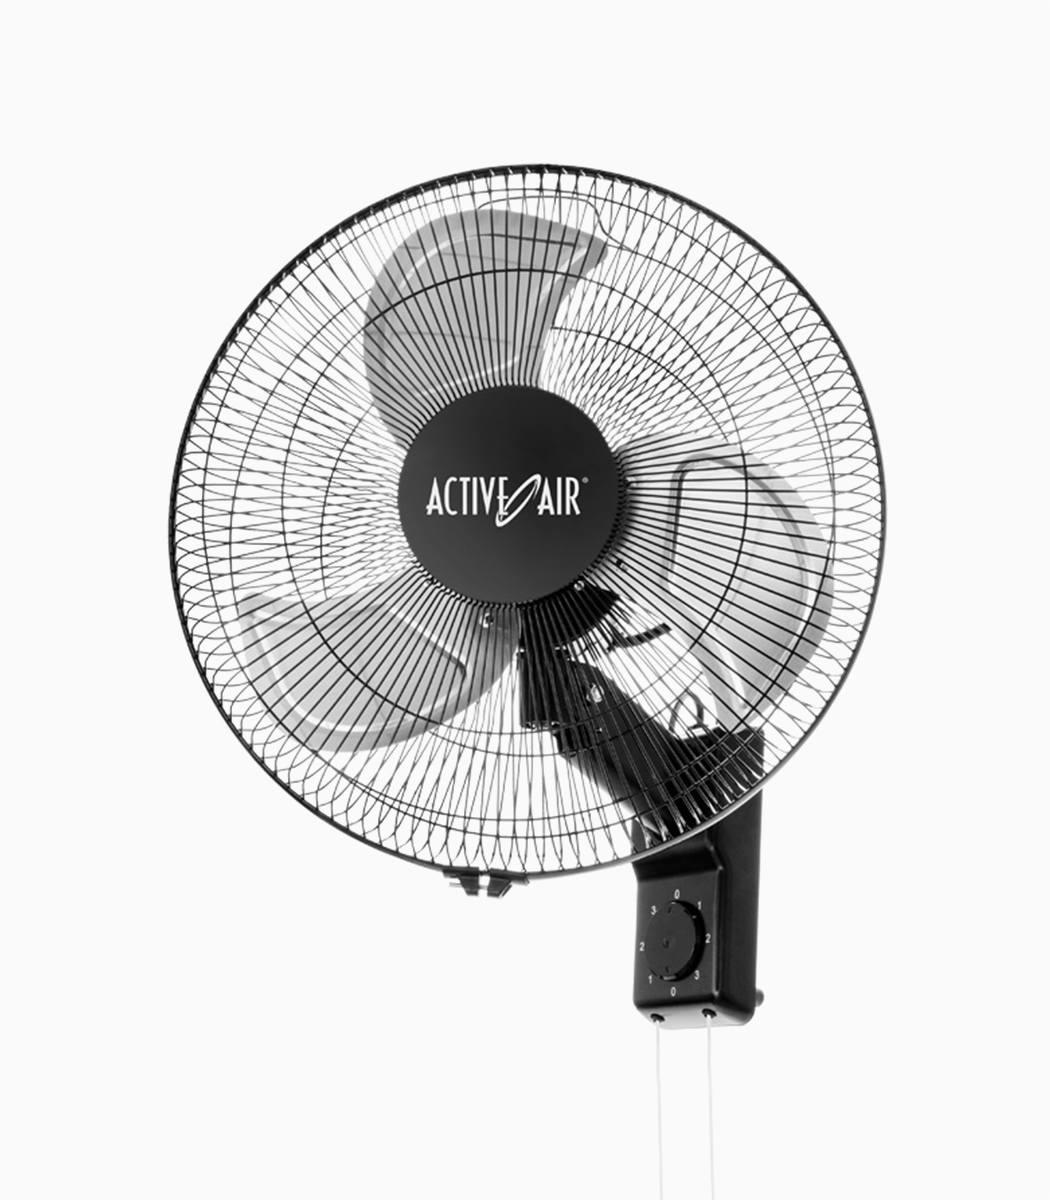 Wall Mount Air Ventilator : Active air heavy duty quot metal wall mount fan